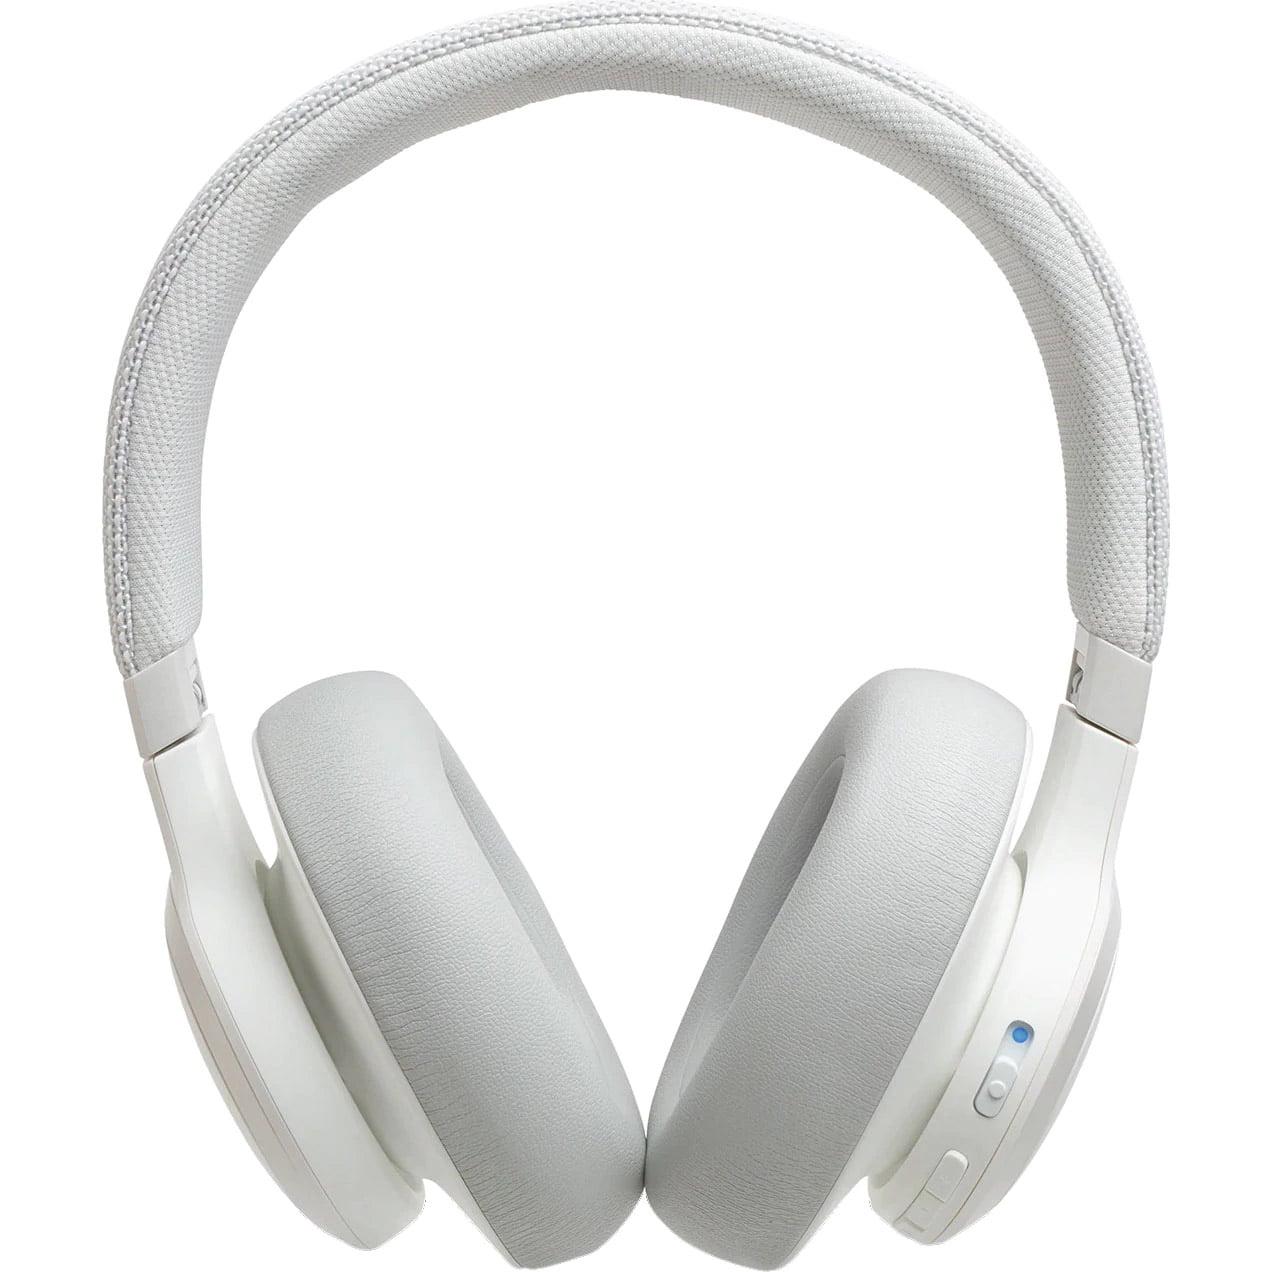 Casti audio Over-Ear JBL Live 650BTNC, Wireless, Bluetooth, JBL Signature Sound, Noise Cancelling, TalkThru Technology, 30h, White